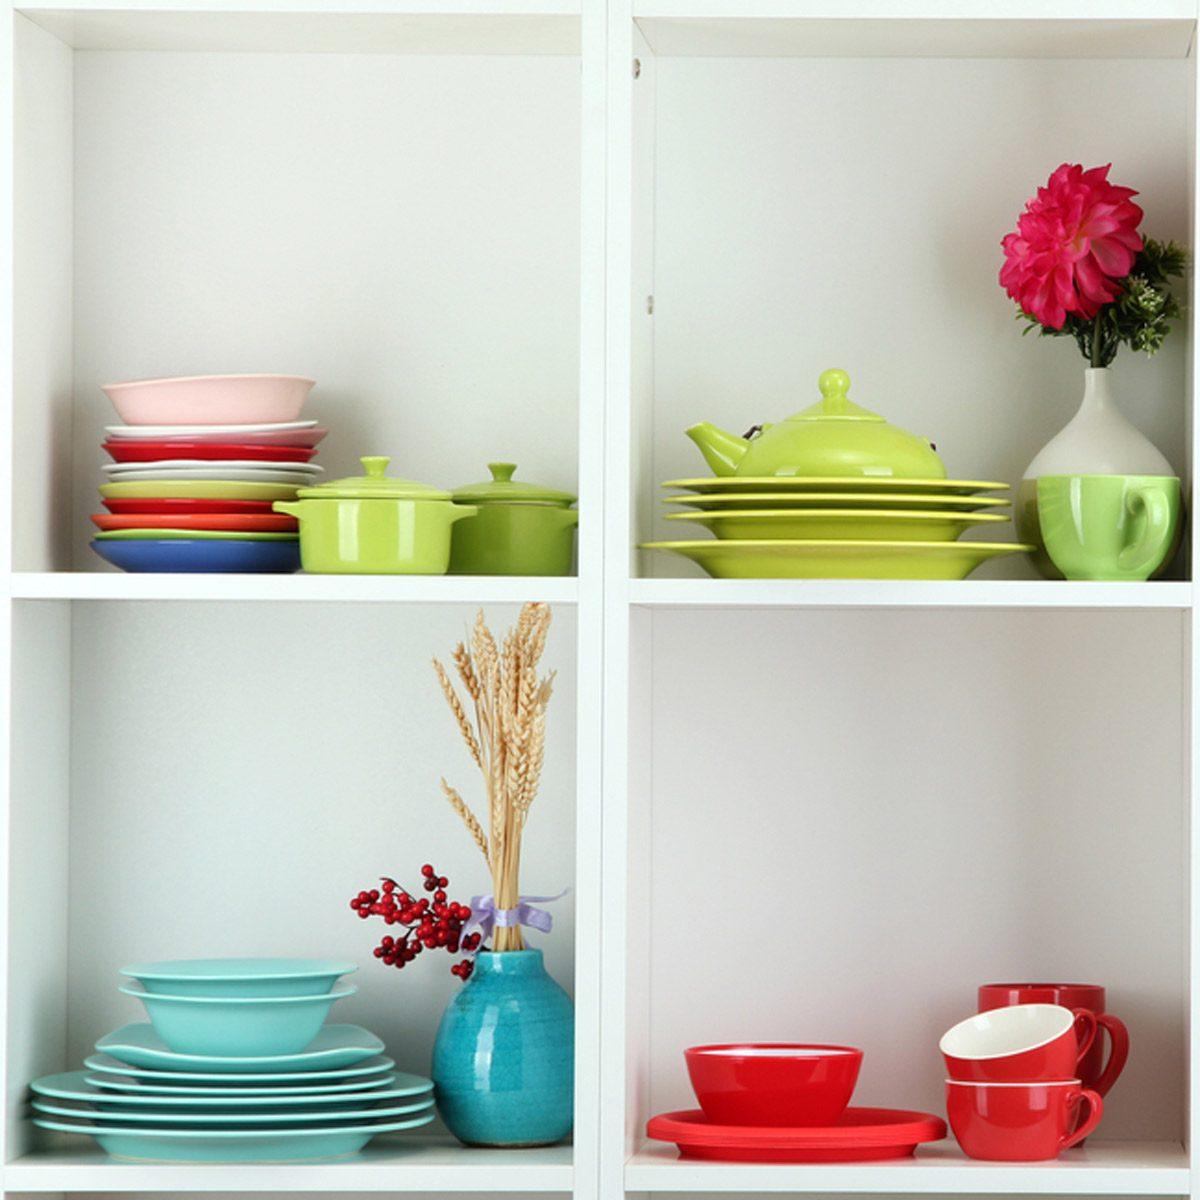 shutterstock_126715016 kitchen box shelf storage organizing your kitchen